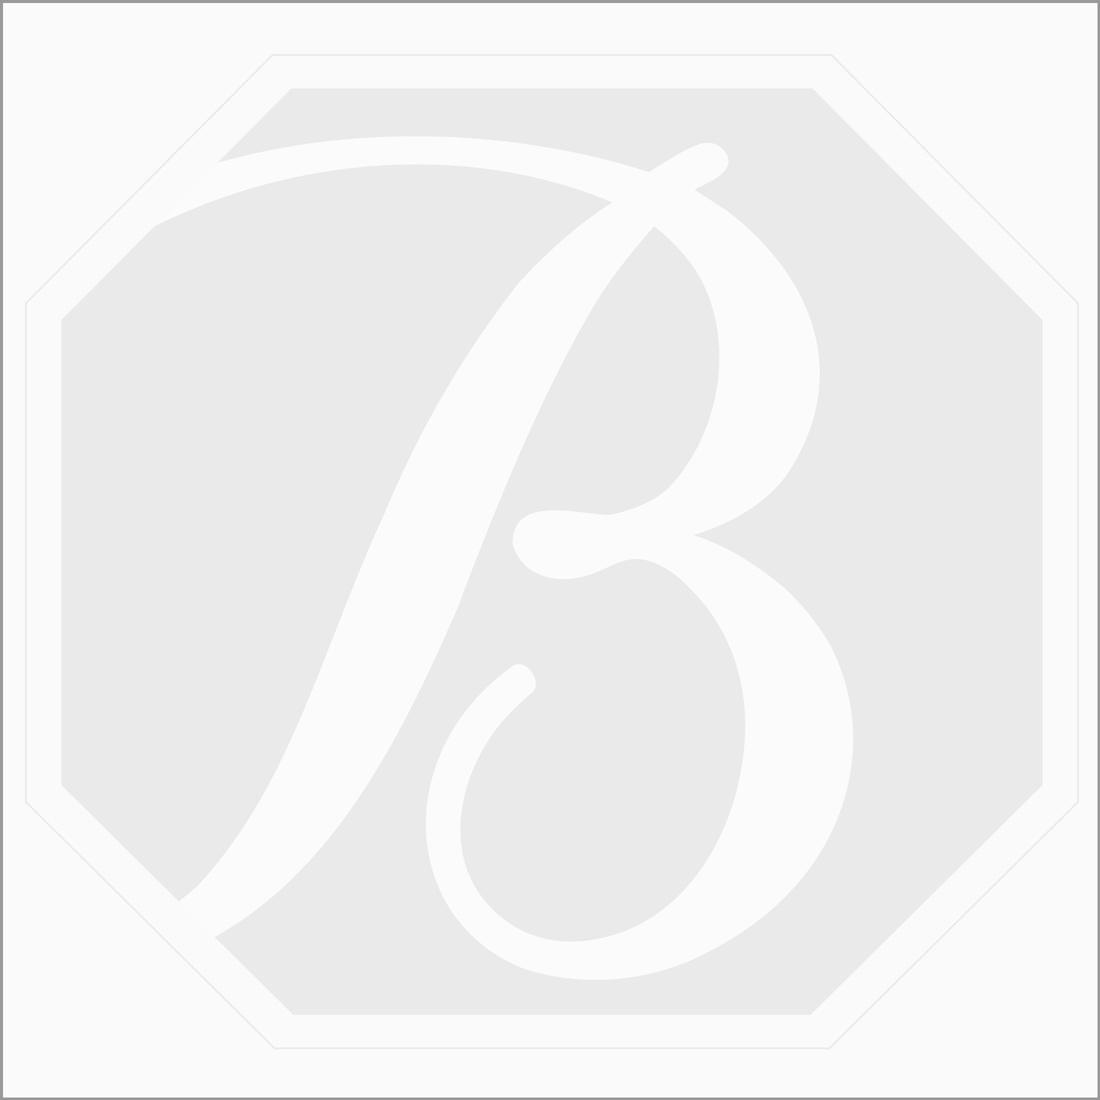 4 Pieces - Medium Tones Multi-Sapphire Rose Cut - 13.50 x 9 mm to 14.50 x 10 mm - 29 carats (MSRC1288)